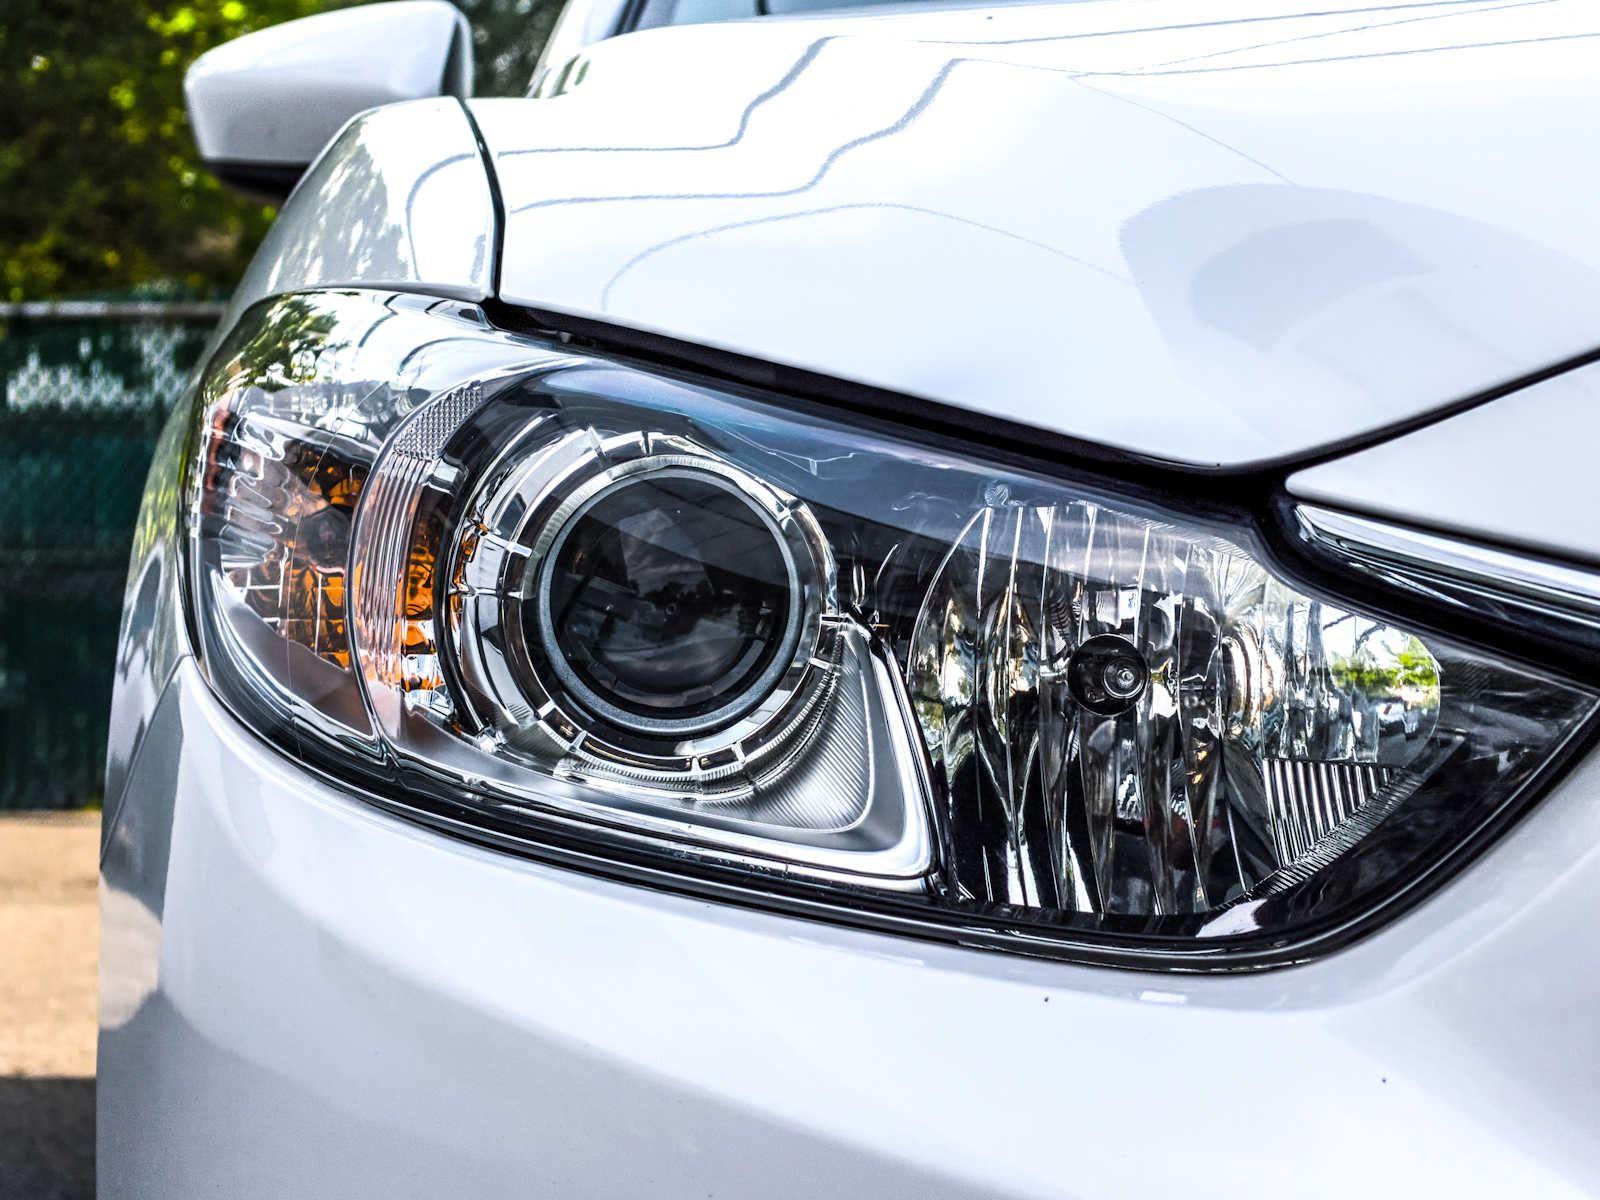 National Car Rental in SeaTac